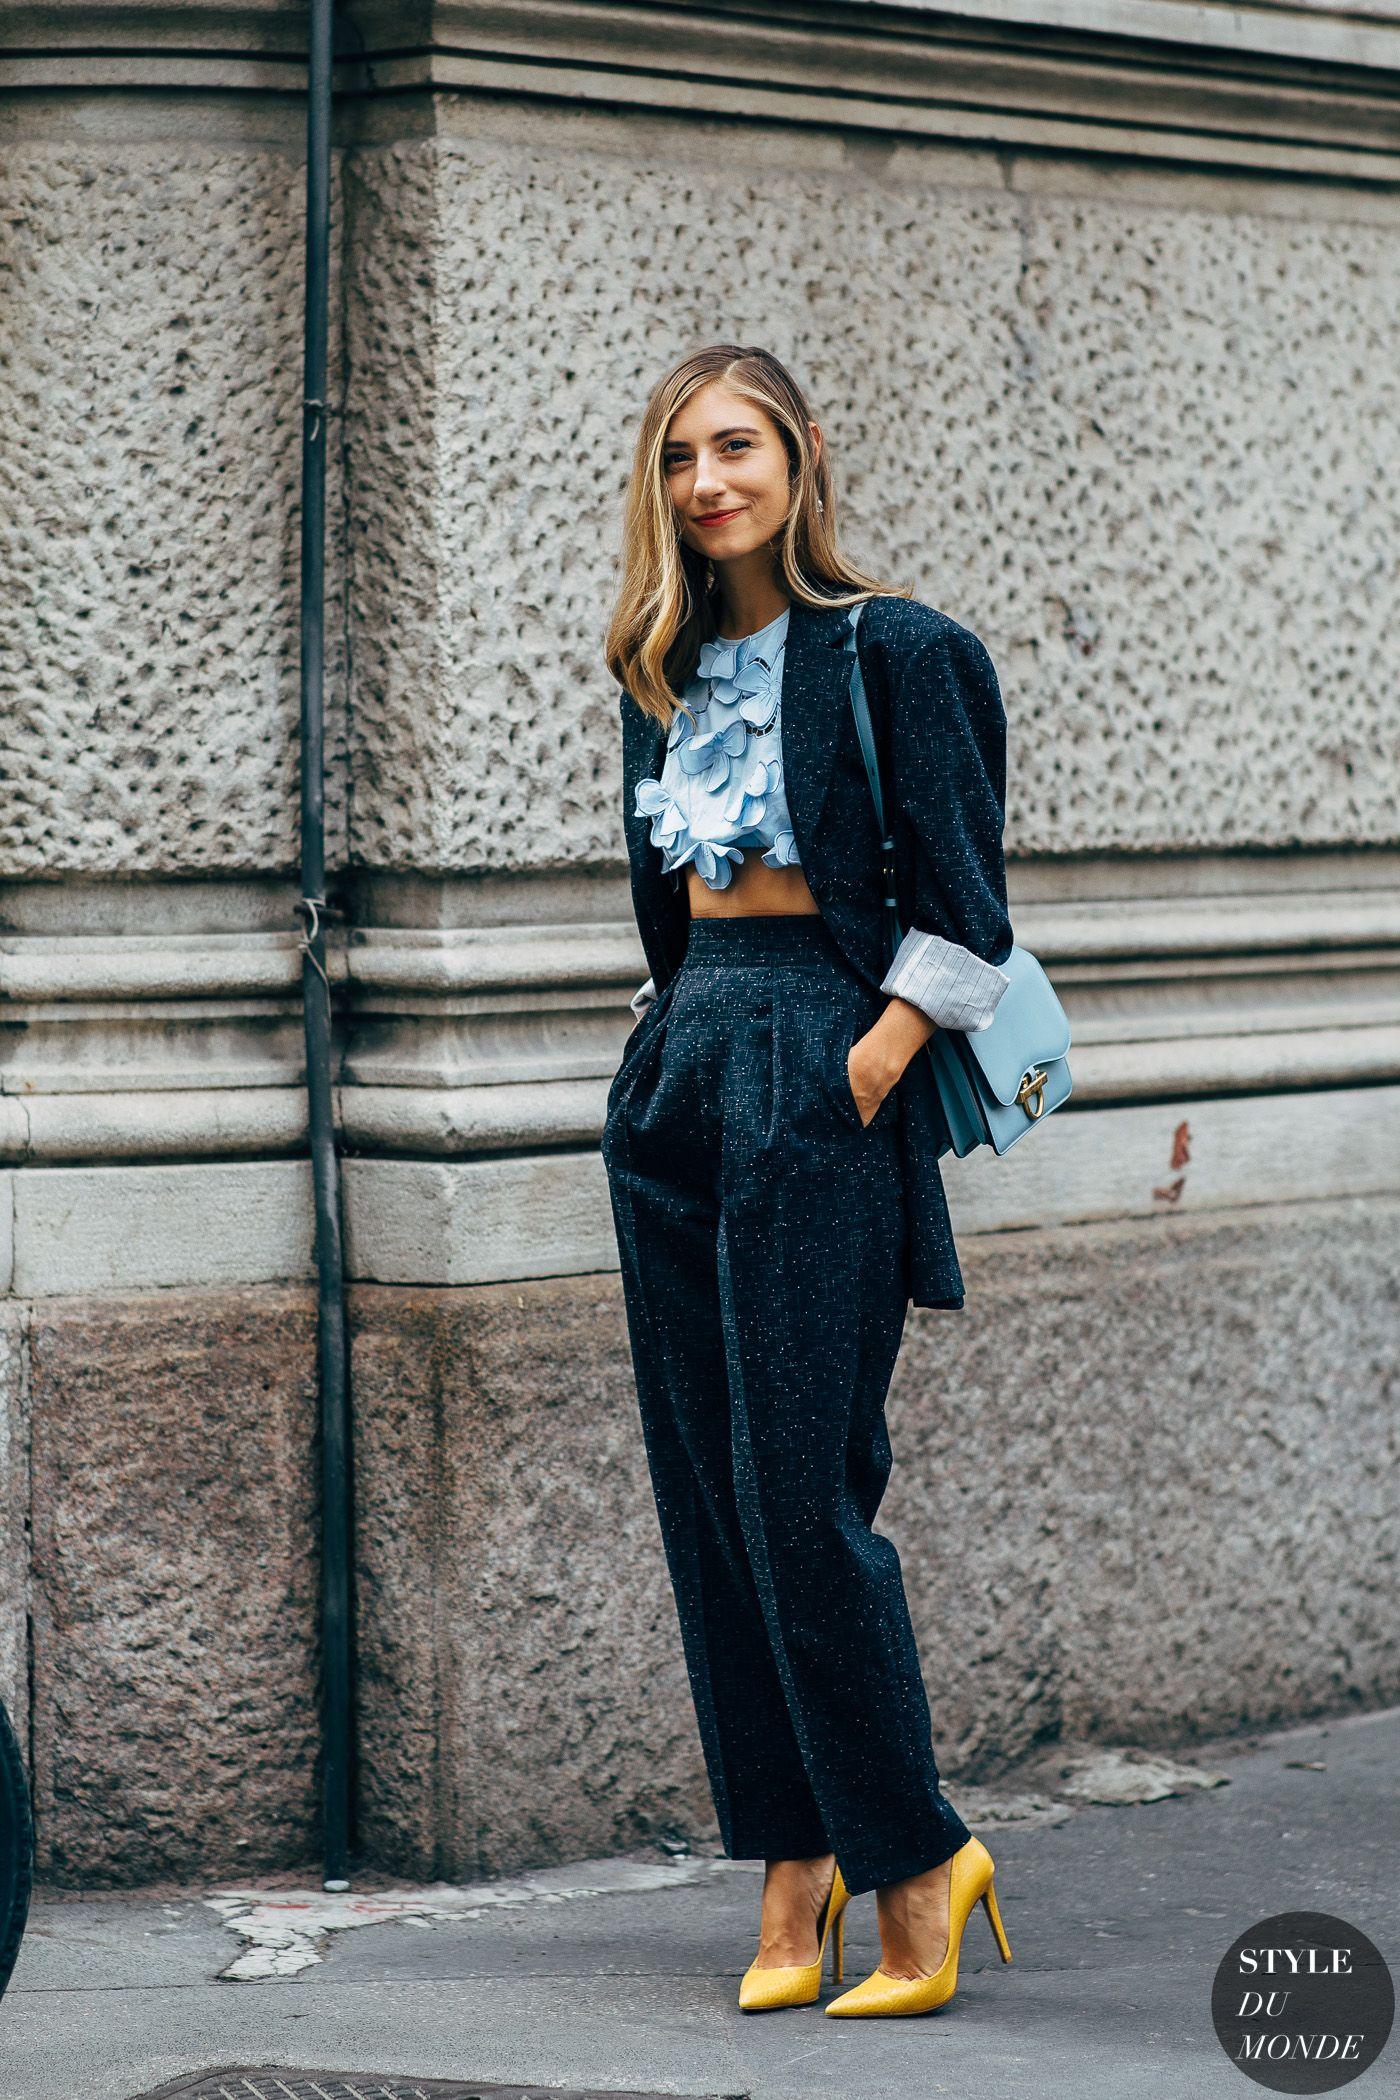 Milan SS 2019 Street Style: Jenny Walton